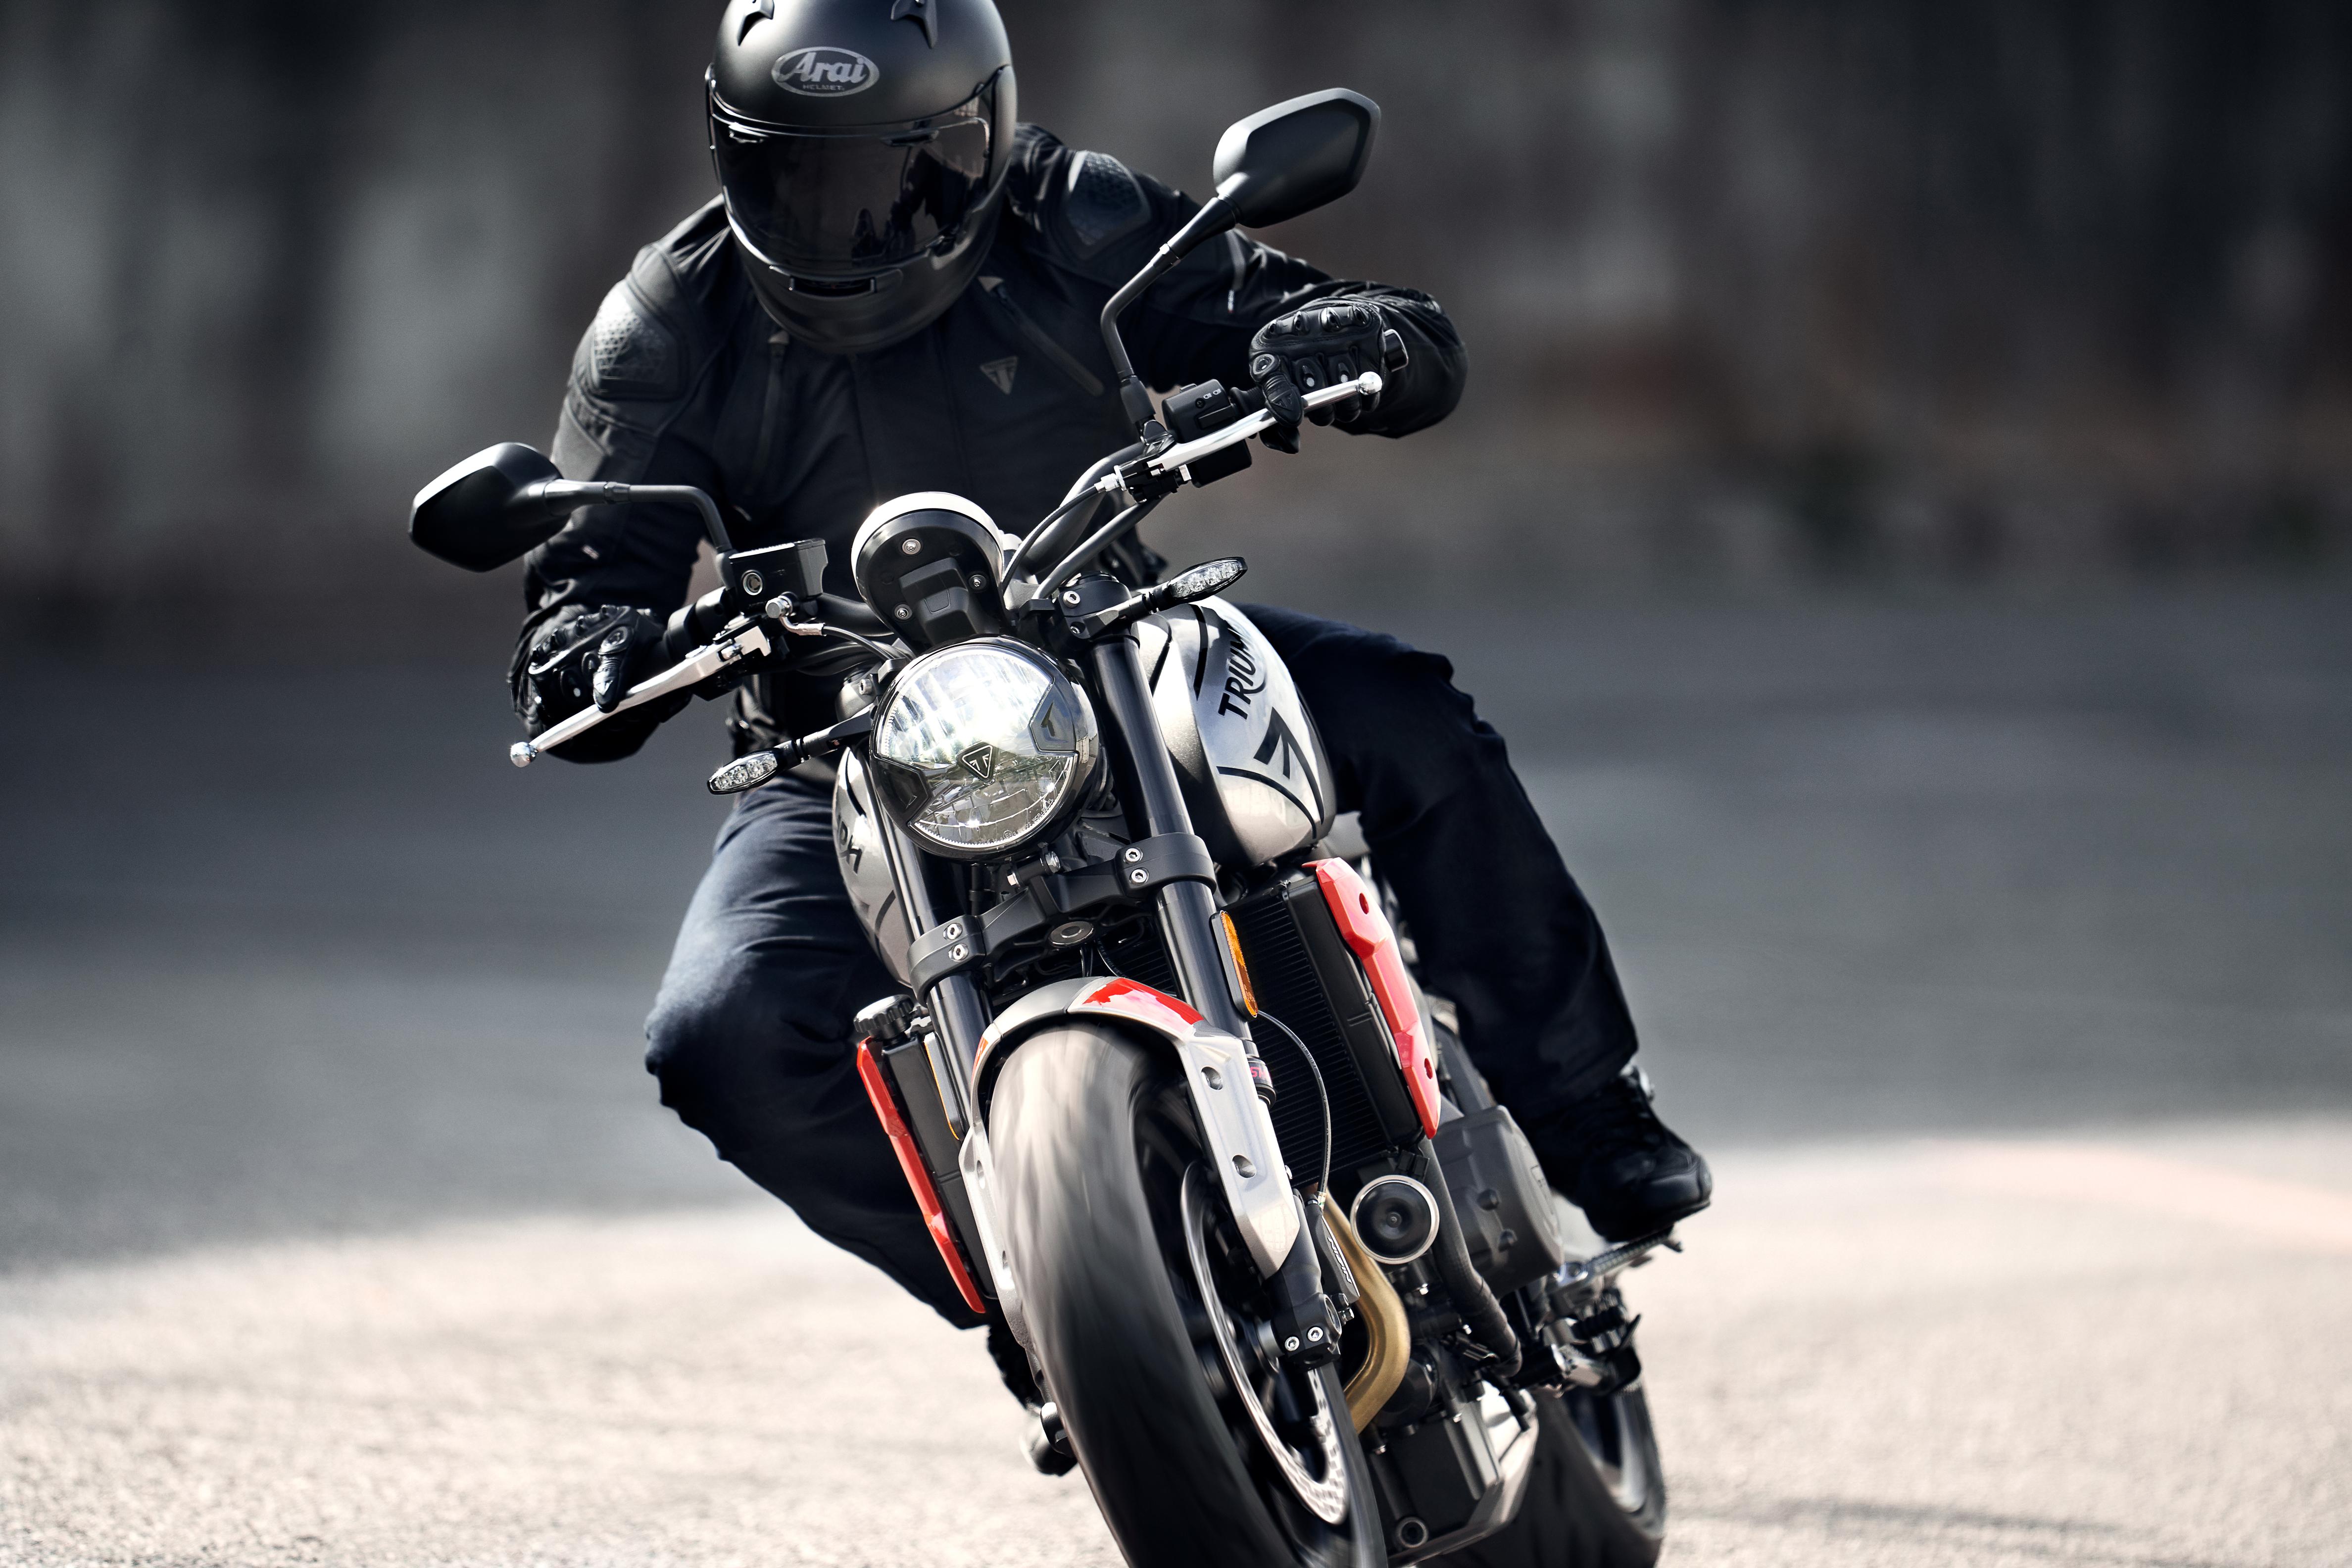 Triumph пожертвовал Trident 660 в лотерею Национального музея мотоциклов